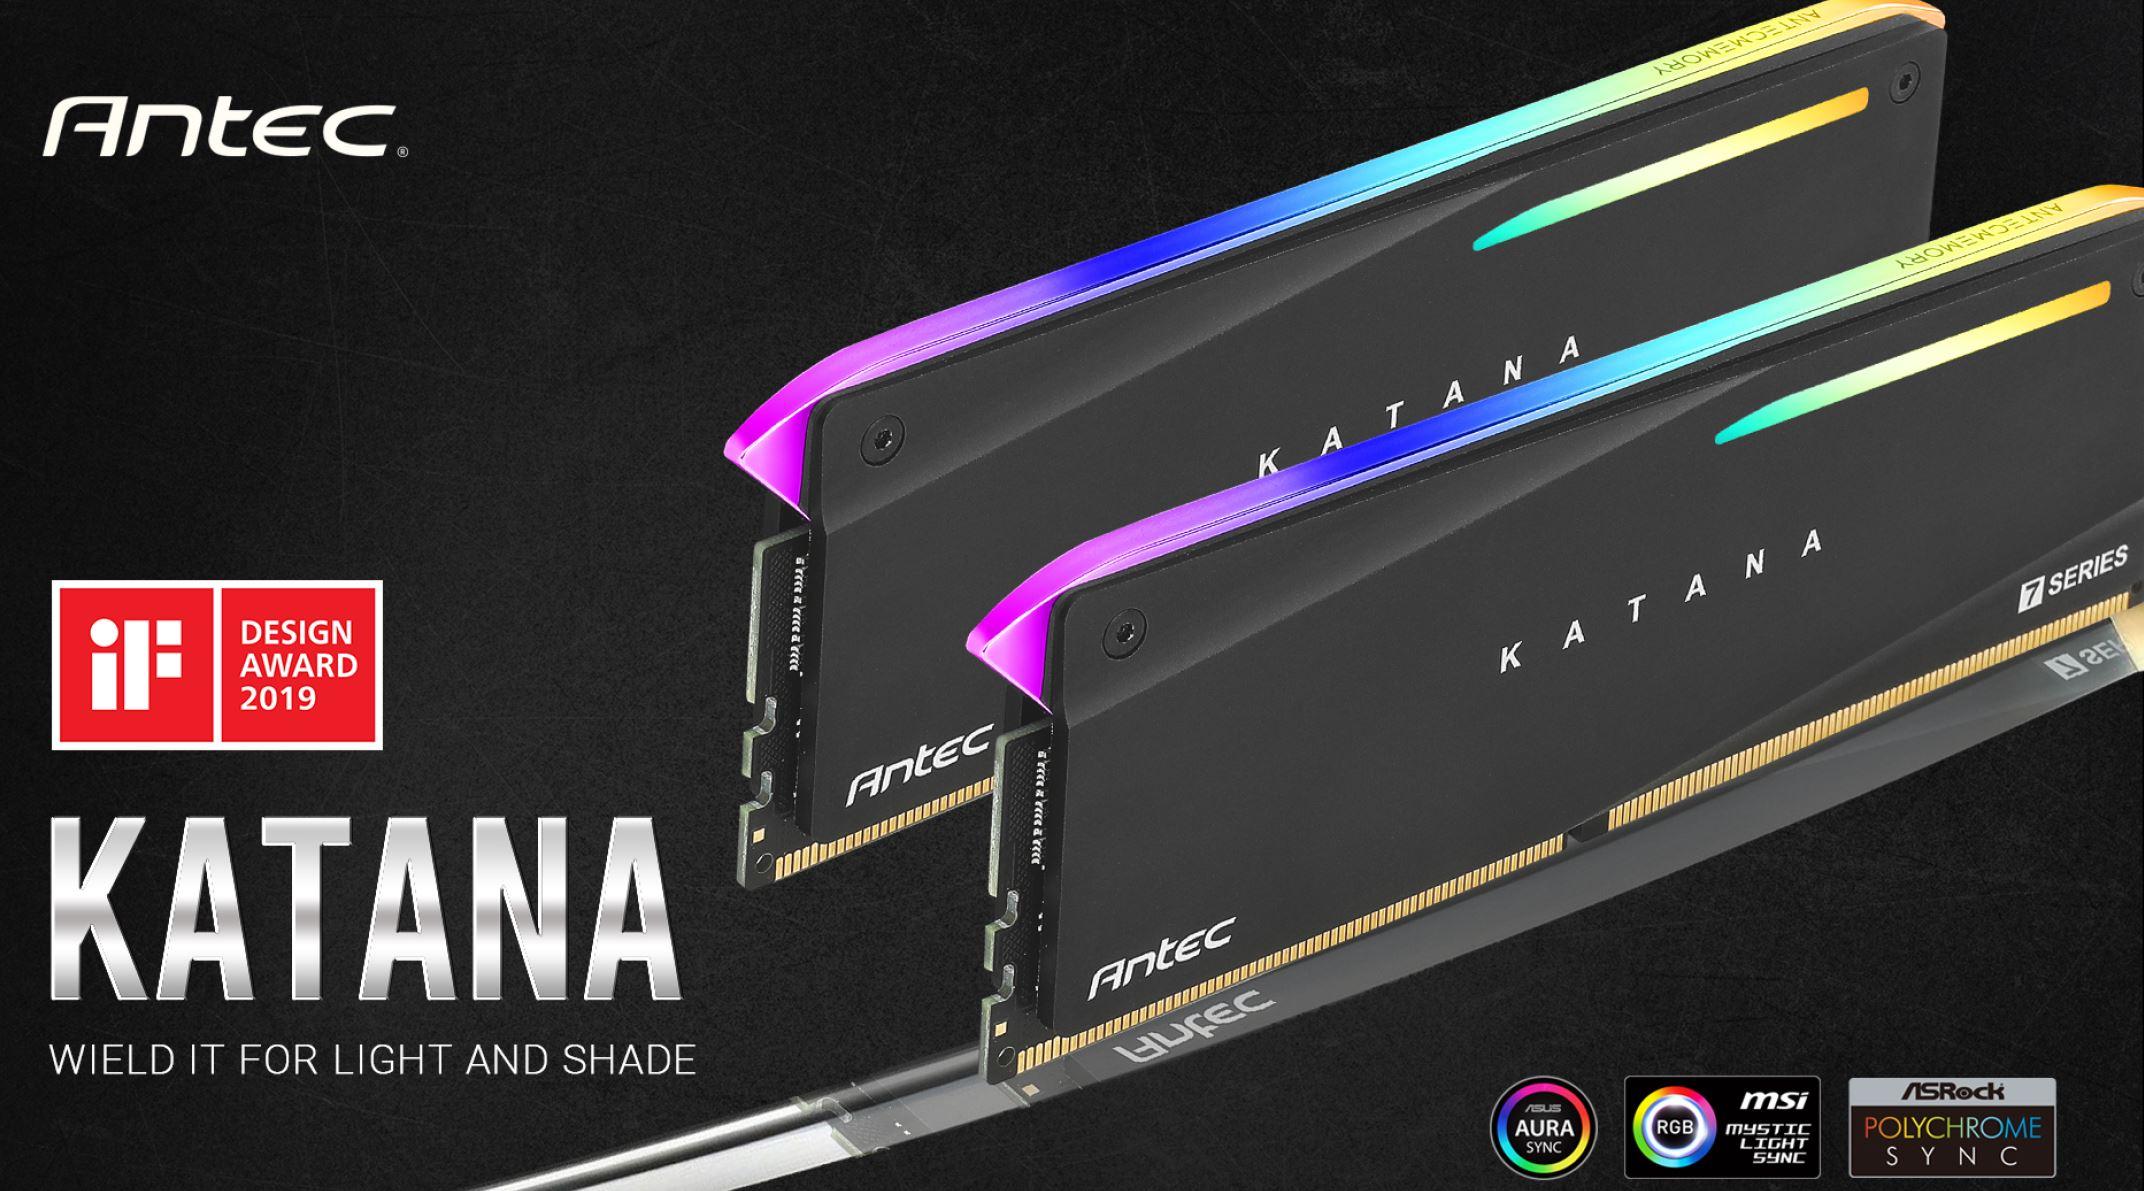 Antec, Katana, RGB, 16GB, (2x8GB), DDR4, 3200MHz, C16, 16-18-18-38, PC4-25600, 1.35V, Desktop, Gaming, Memory,